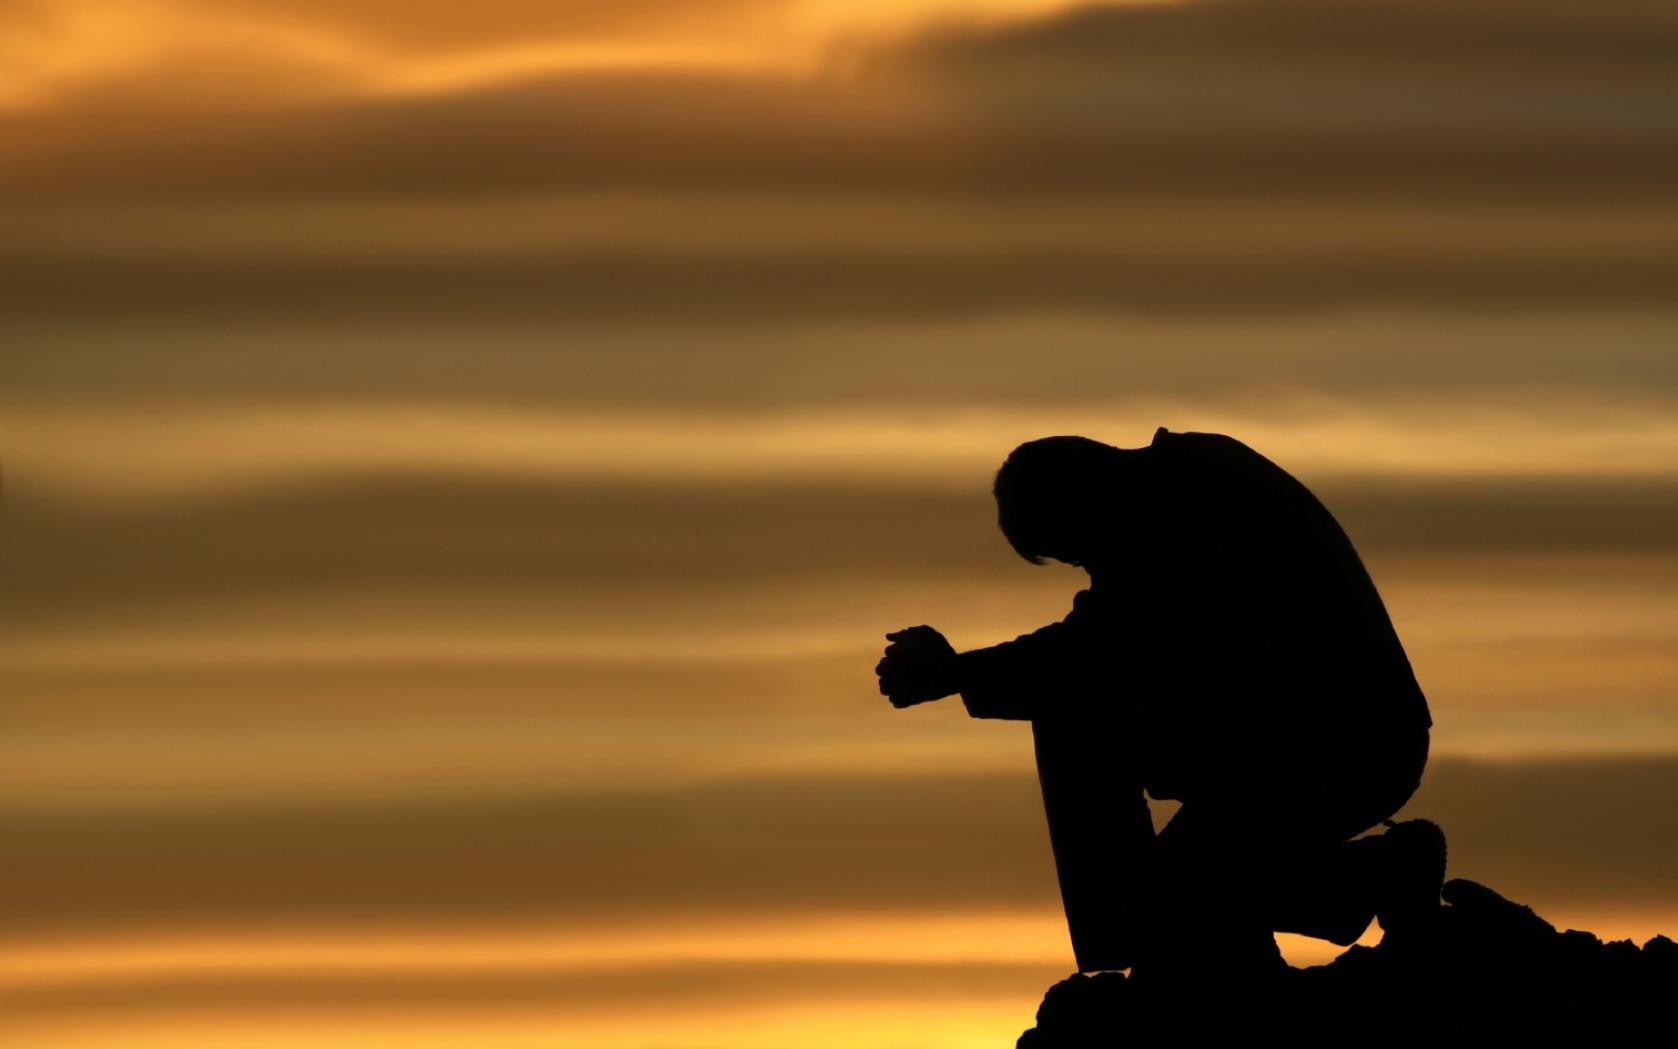 we need to pray